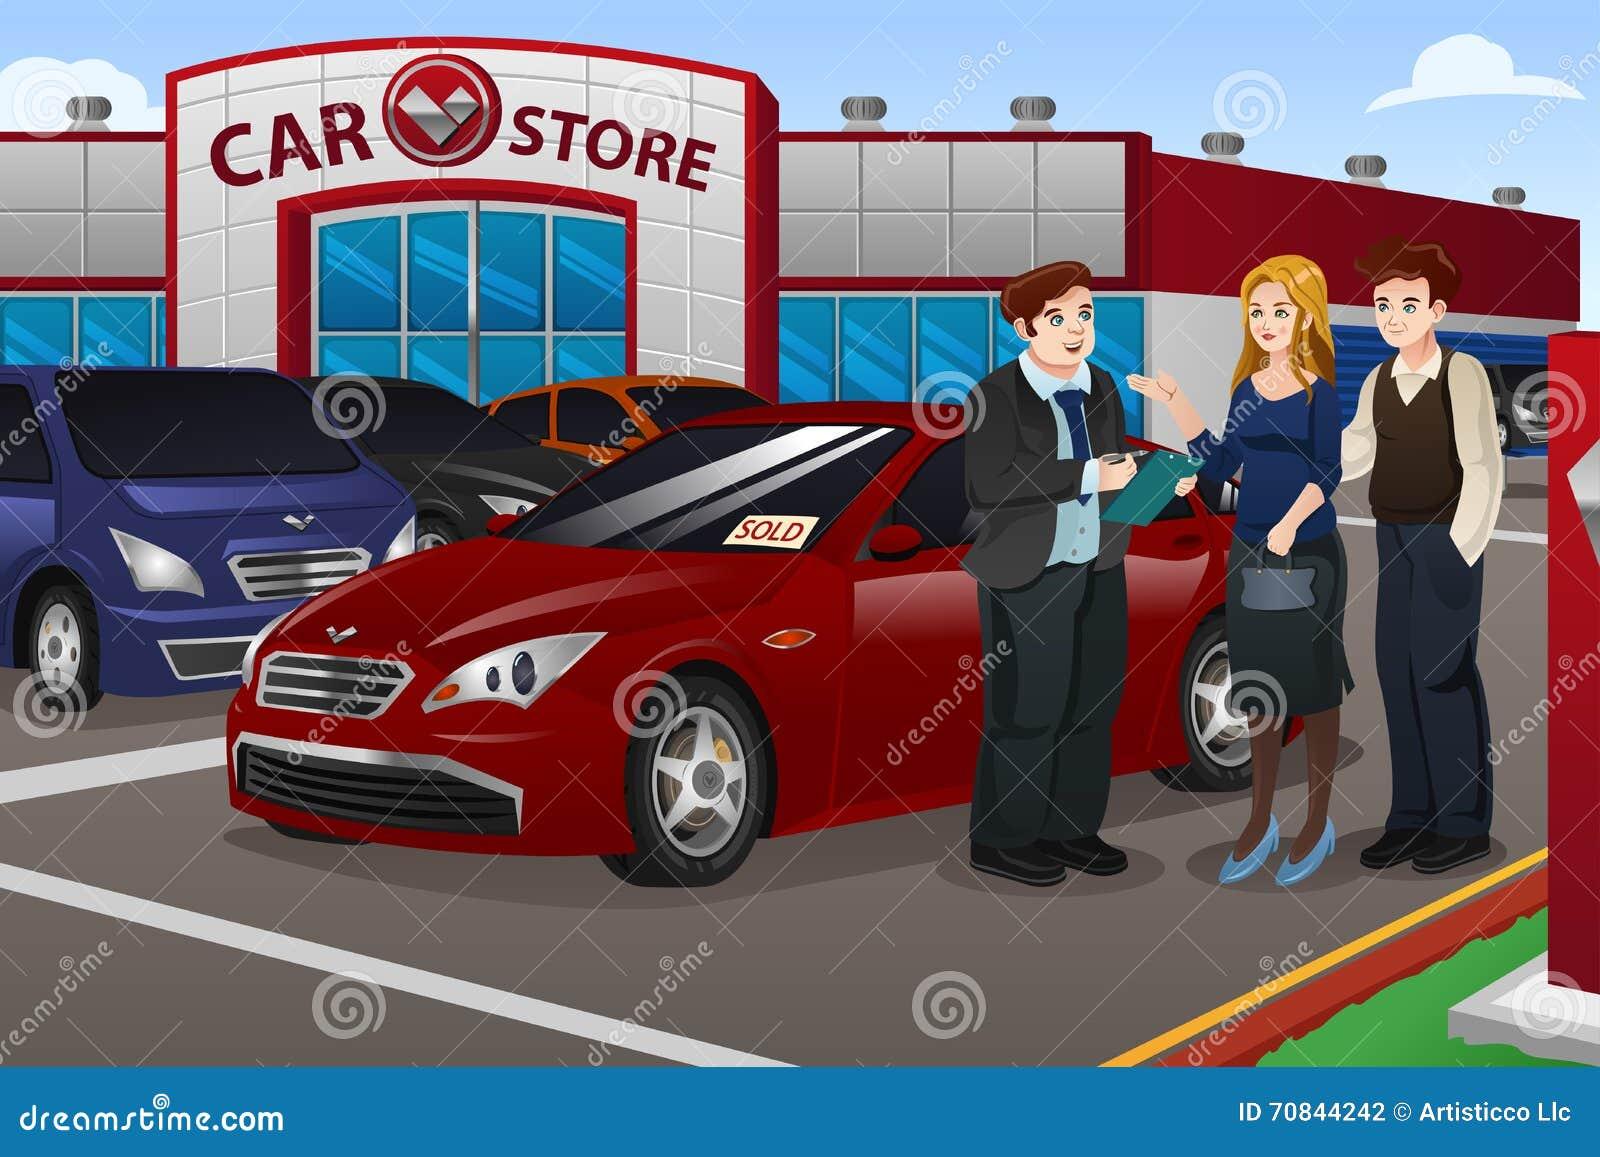 couple buying new car stock illustration image 70844242. Black Bedroom Furniture Sets. Home Design Ideas